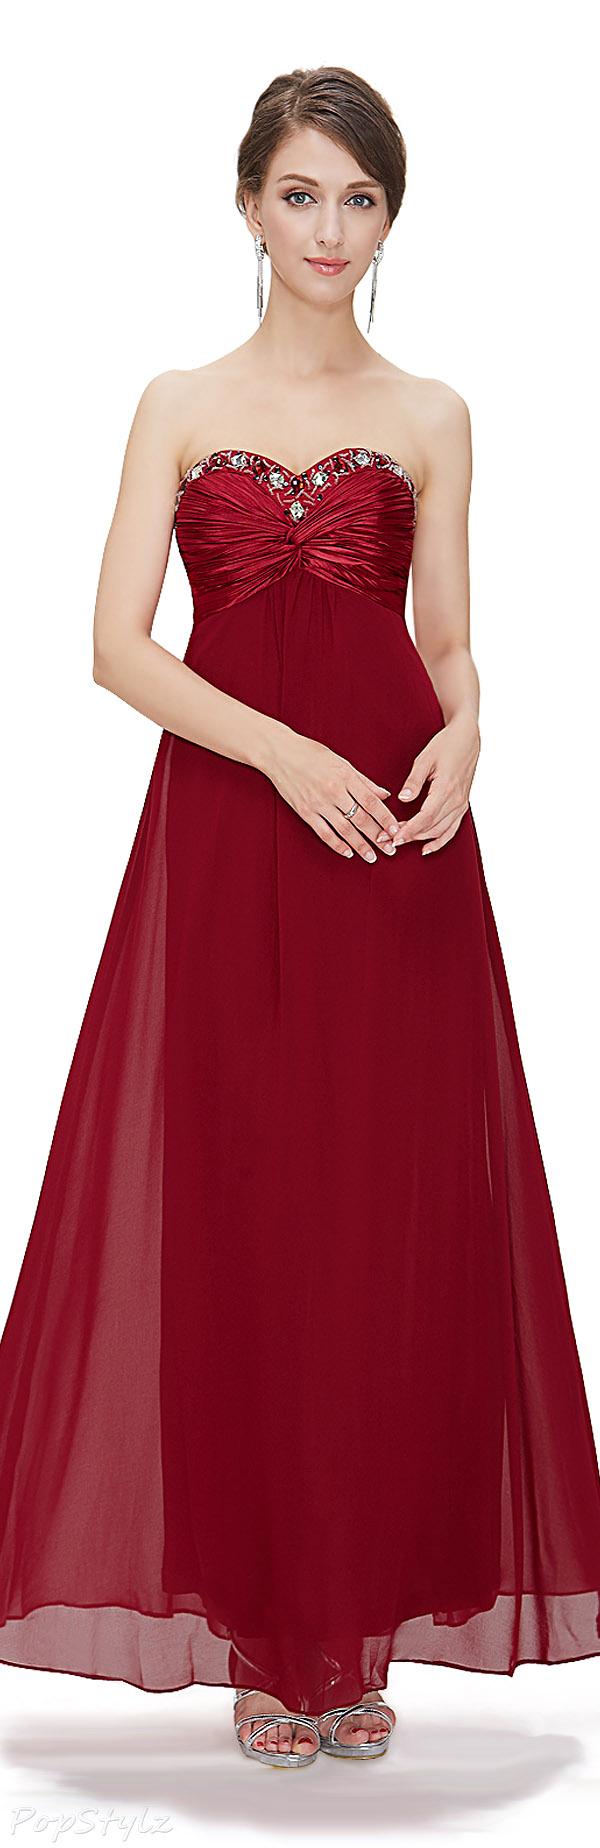 Ever Pretty 09568 Chiffon Rhinestones Crystal Beads Sweetheart Gown